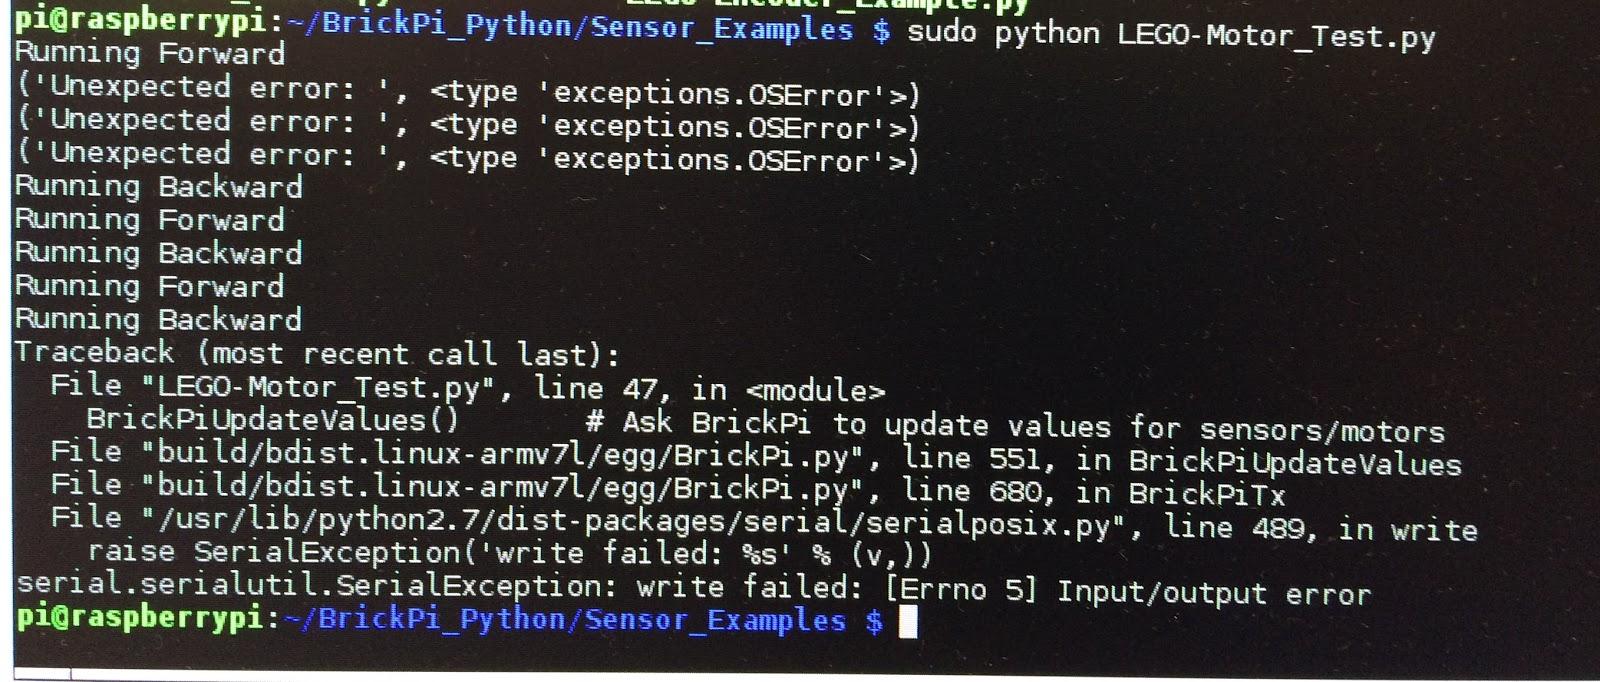 Getting around IO errors on Raspberry Pi 3 with BrickPi